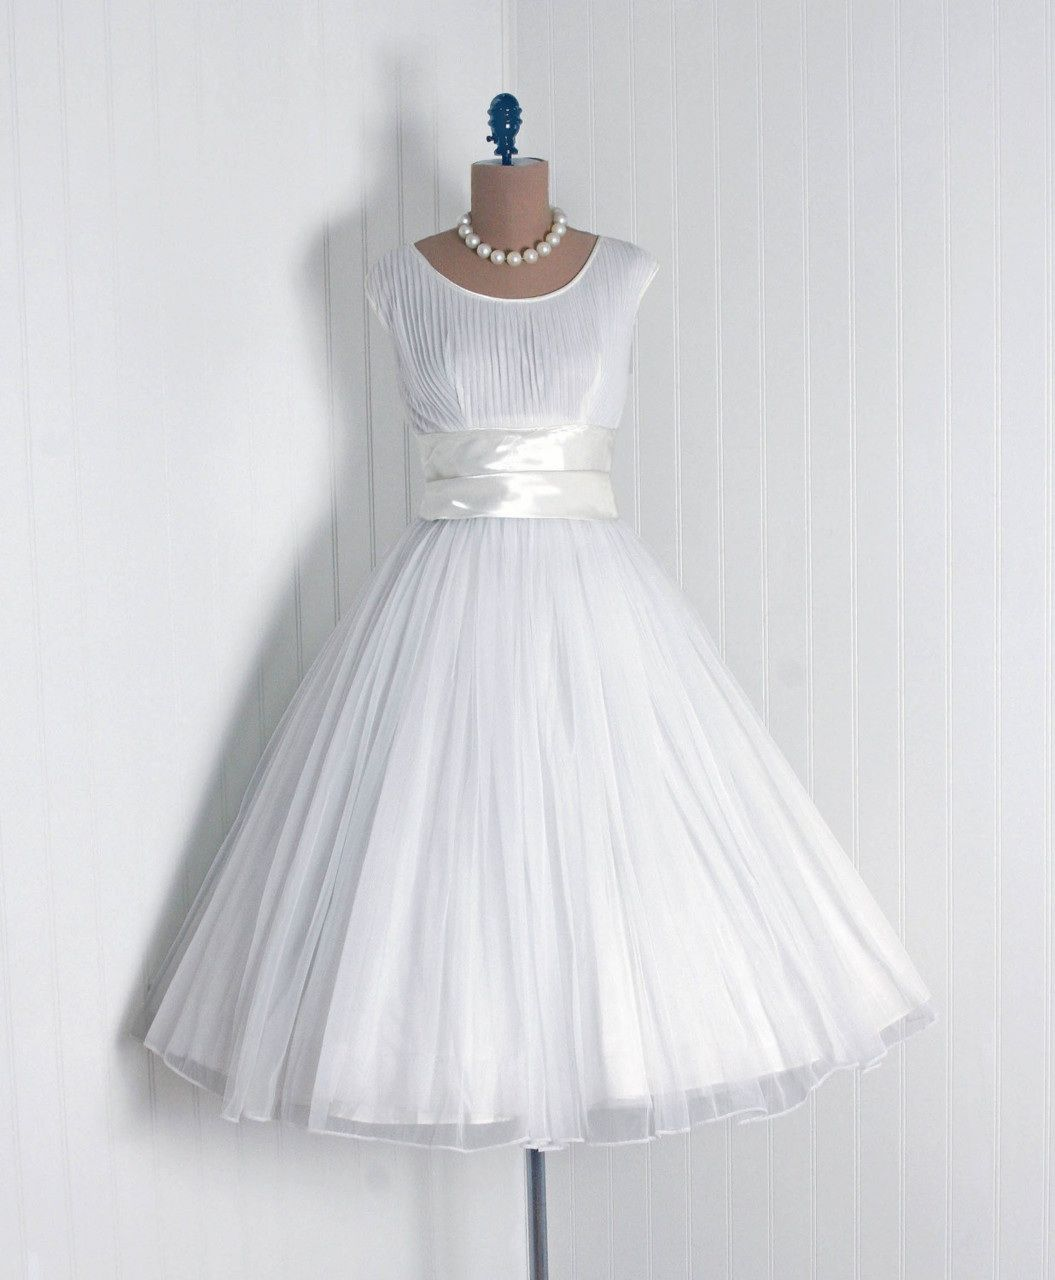 Wedding Dress - Emma Domb, 1950s